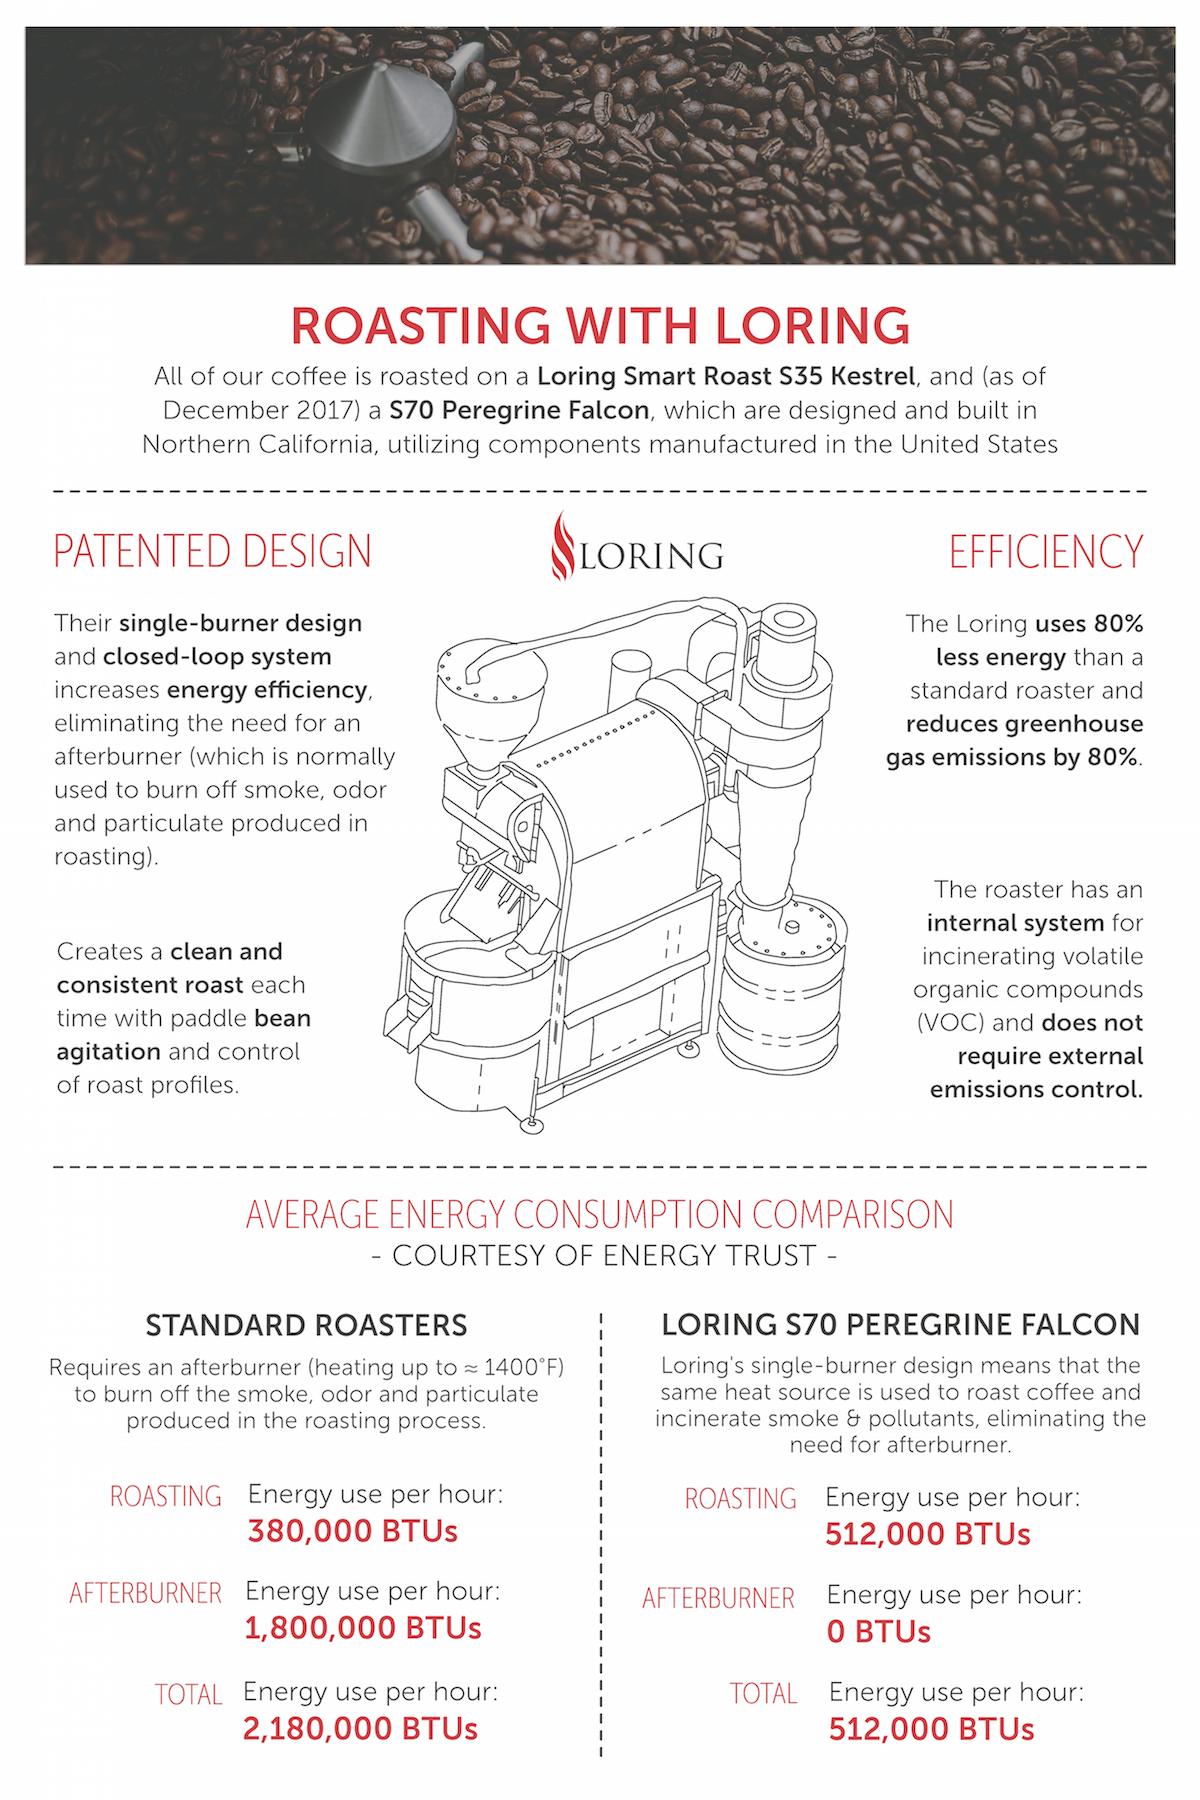 Nossa Familia Coffee - Roasting with Loring